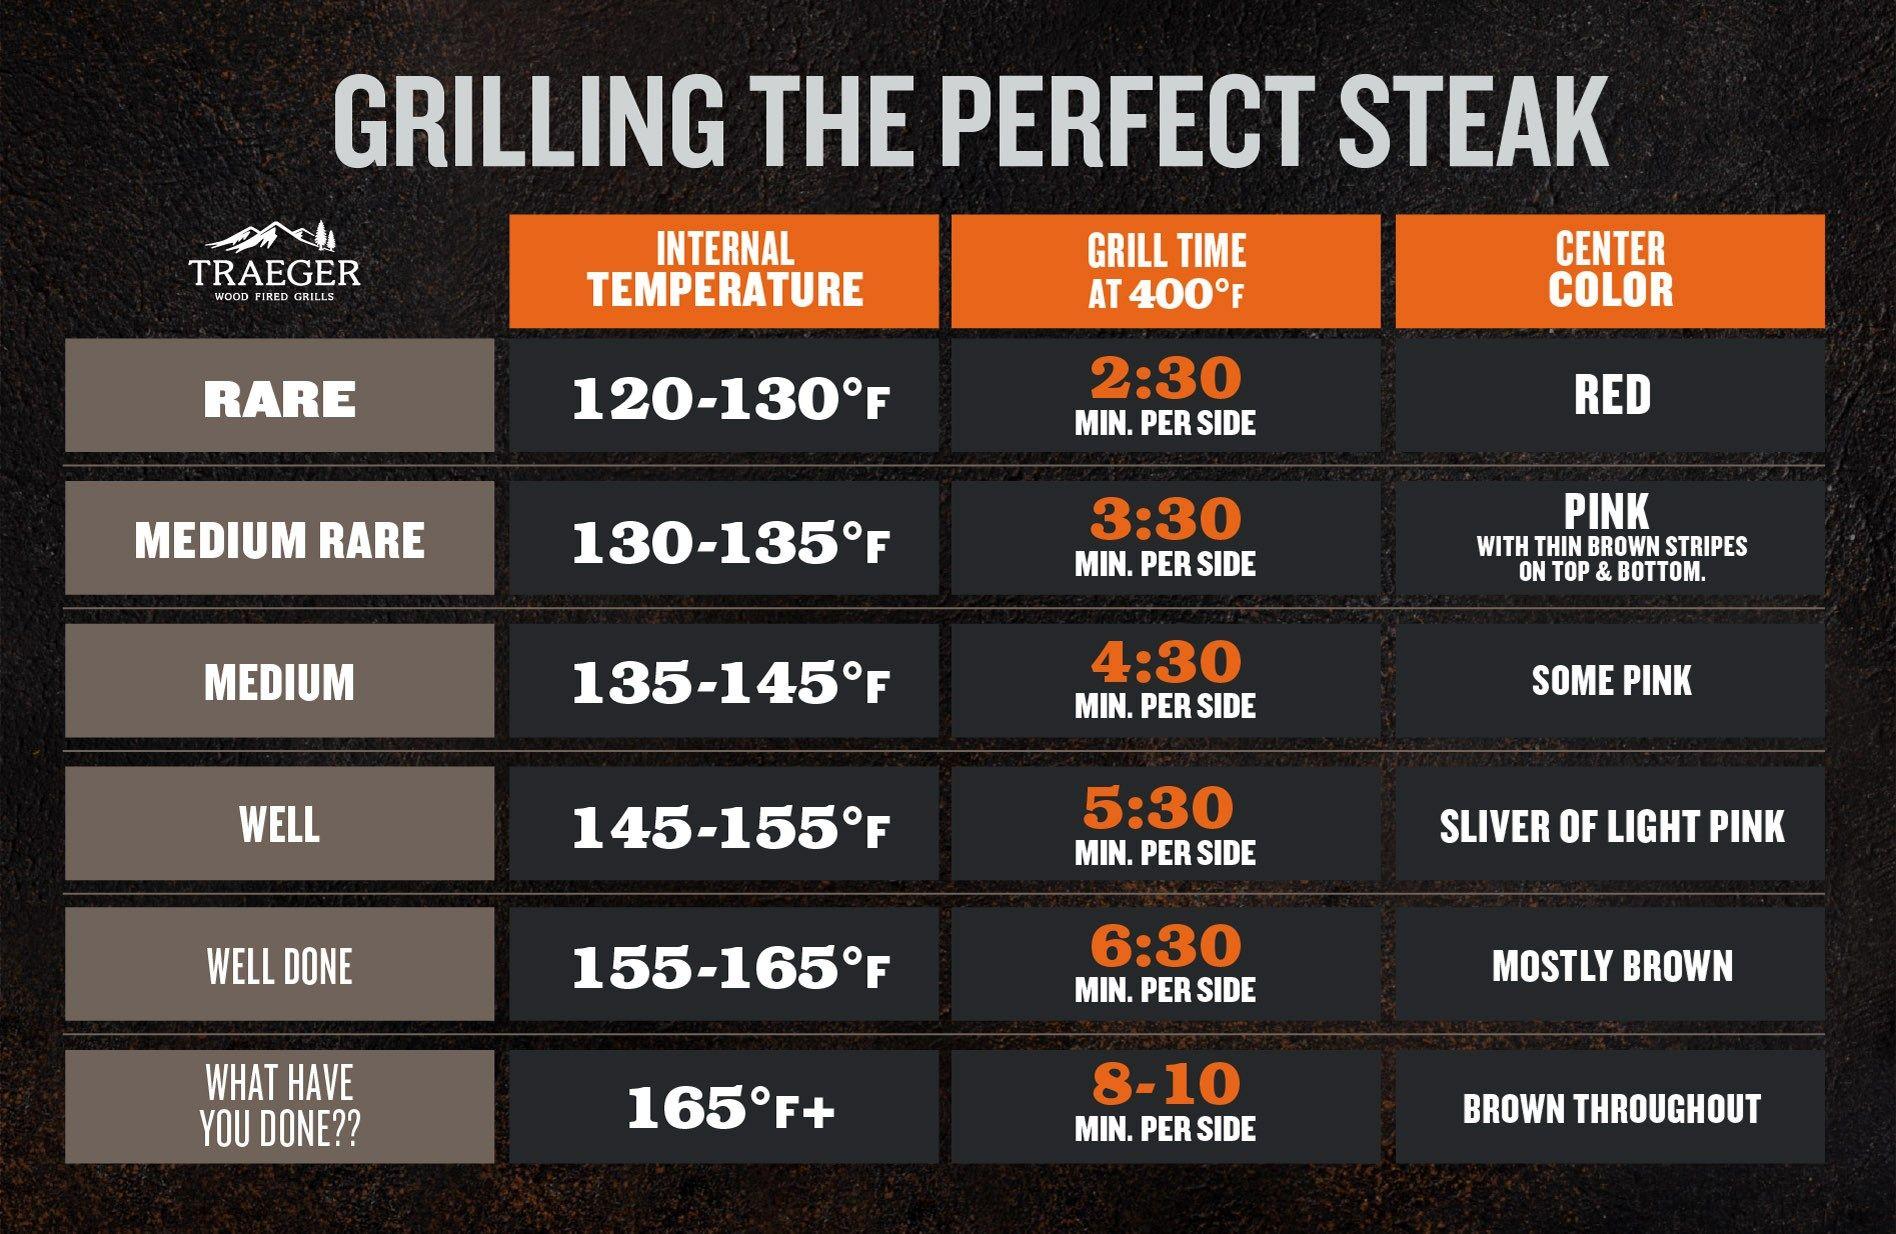 Steak Doneness Internal Temperatures Times Traeger Grills Steak Doneness How To Grill Steak Grilled Steak Recipes